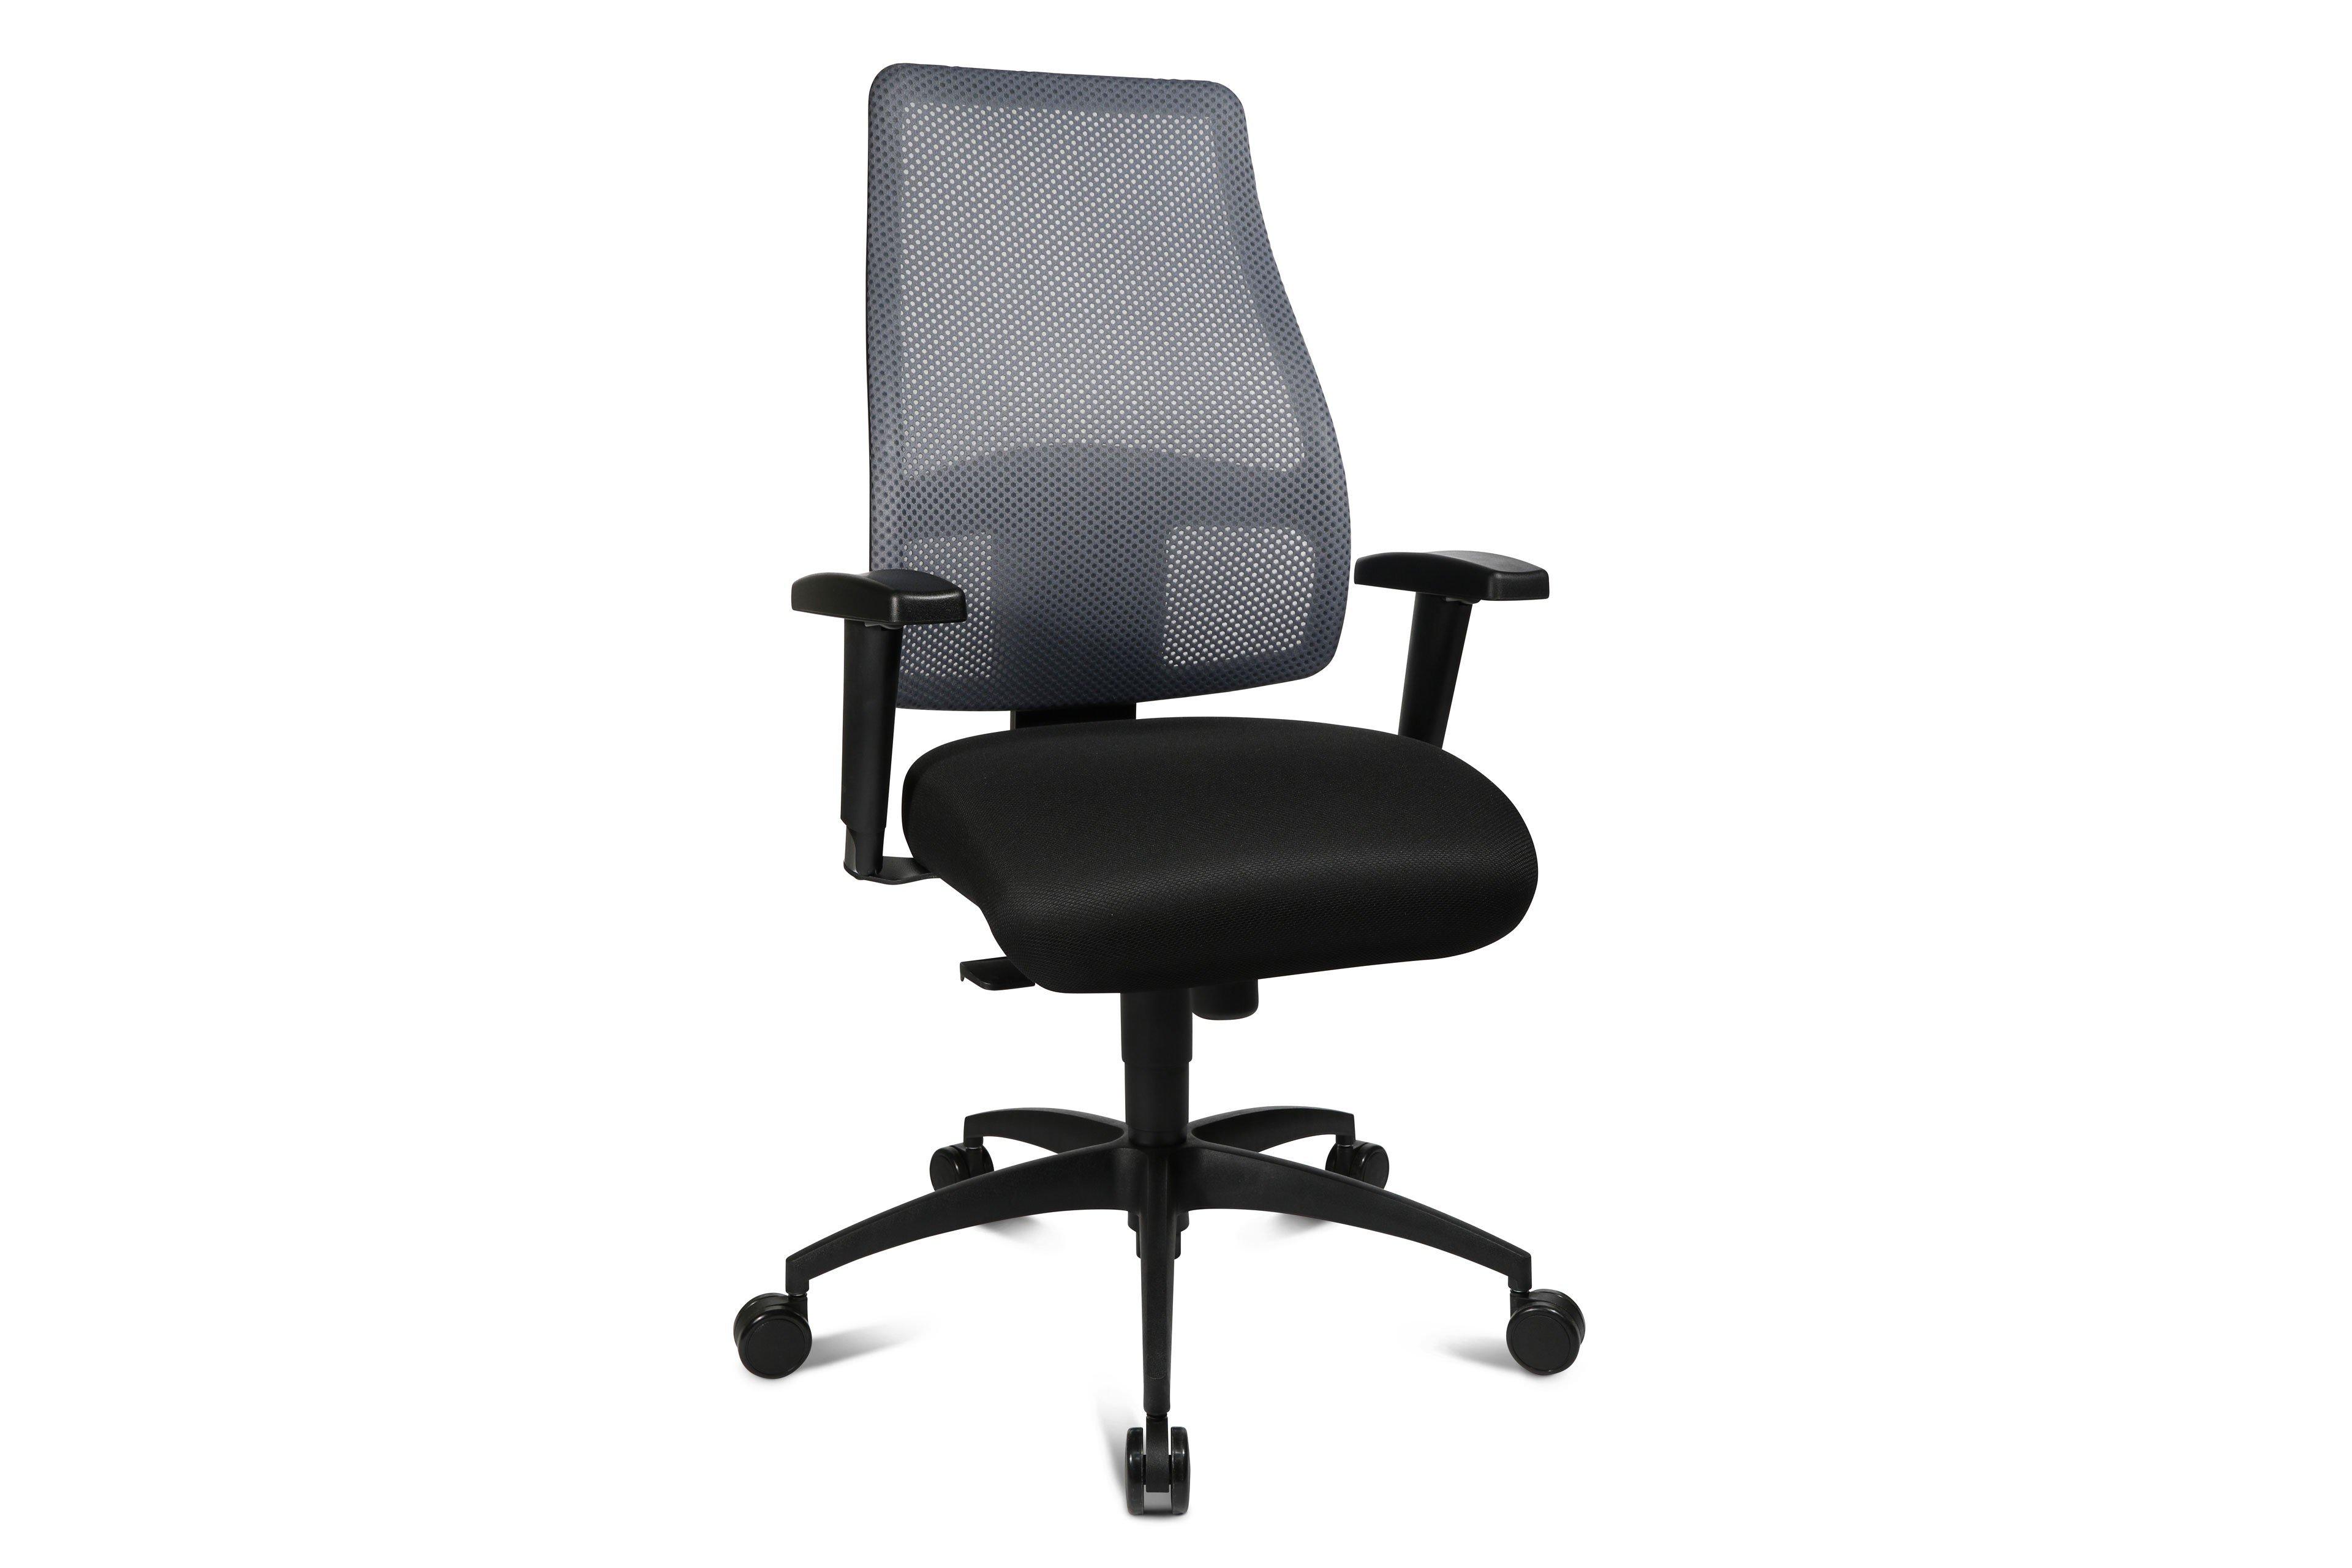 Topstar Drehstuhl Linea Comfort grau/ schwarz | Möbel Letz - Ihr ...